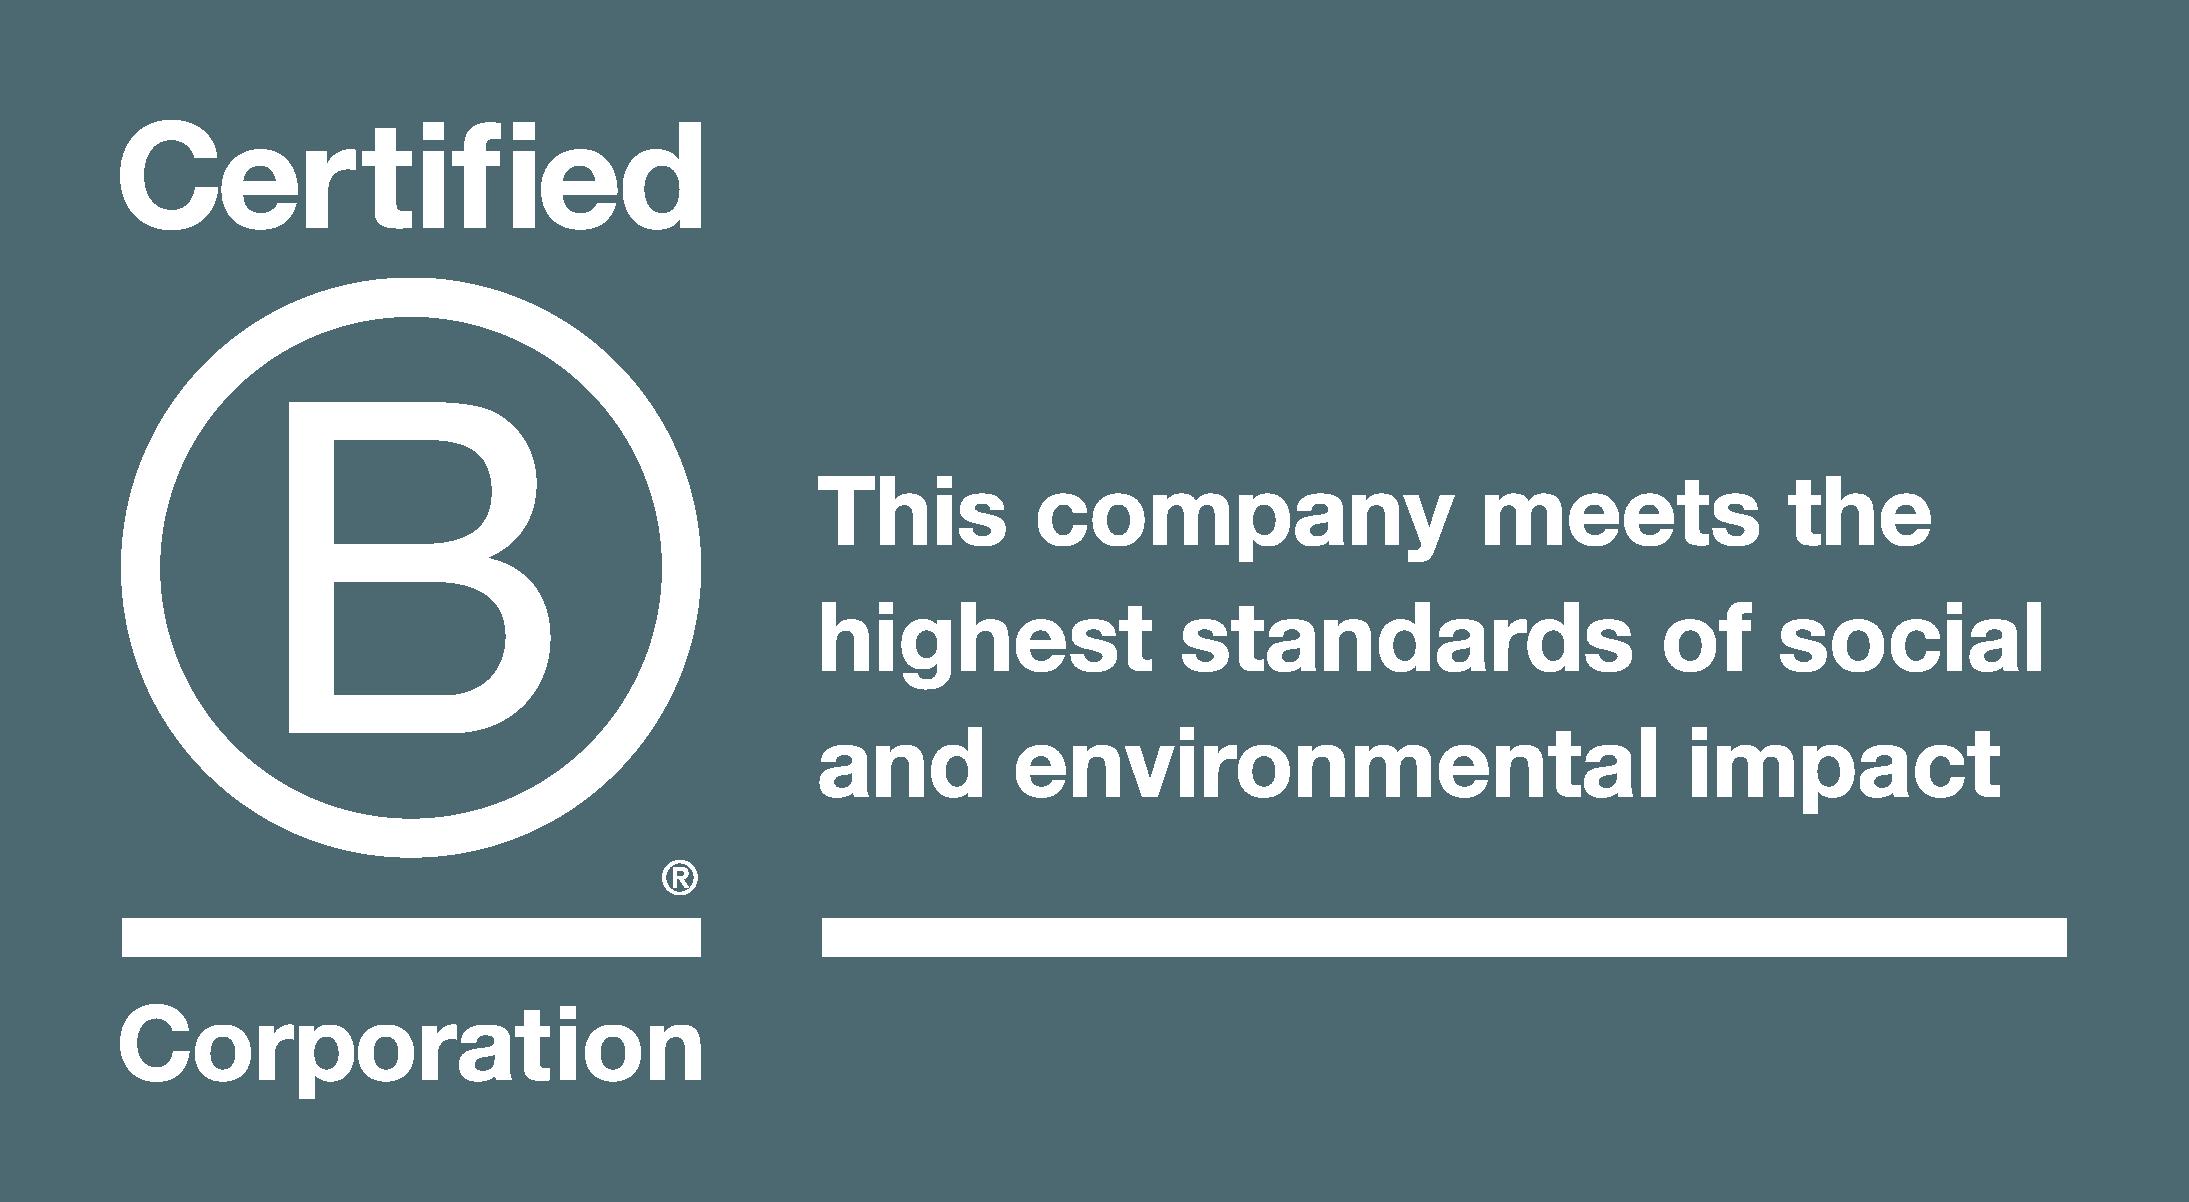 Certified B Corporation